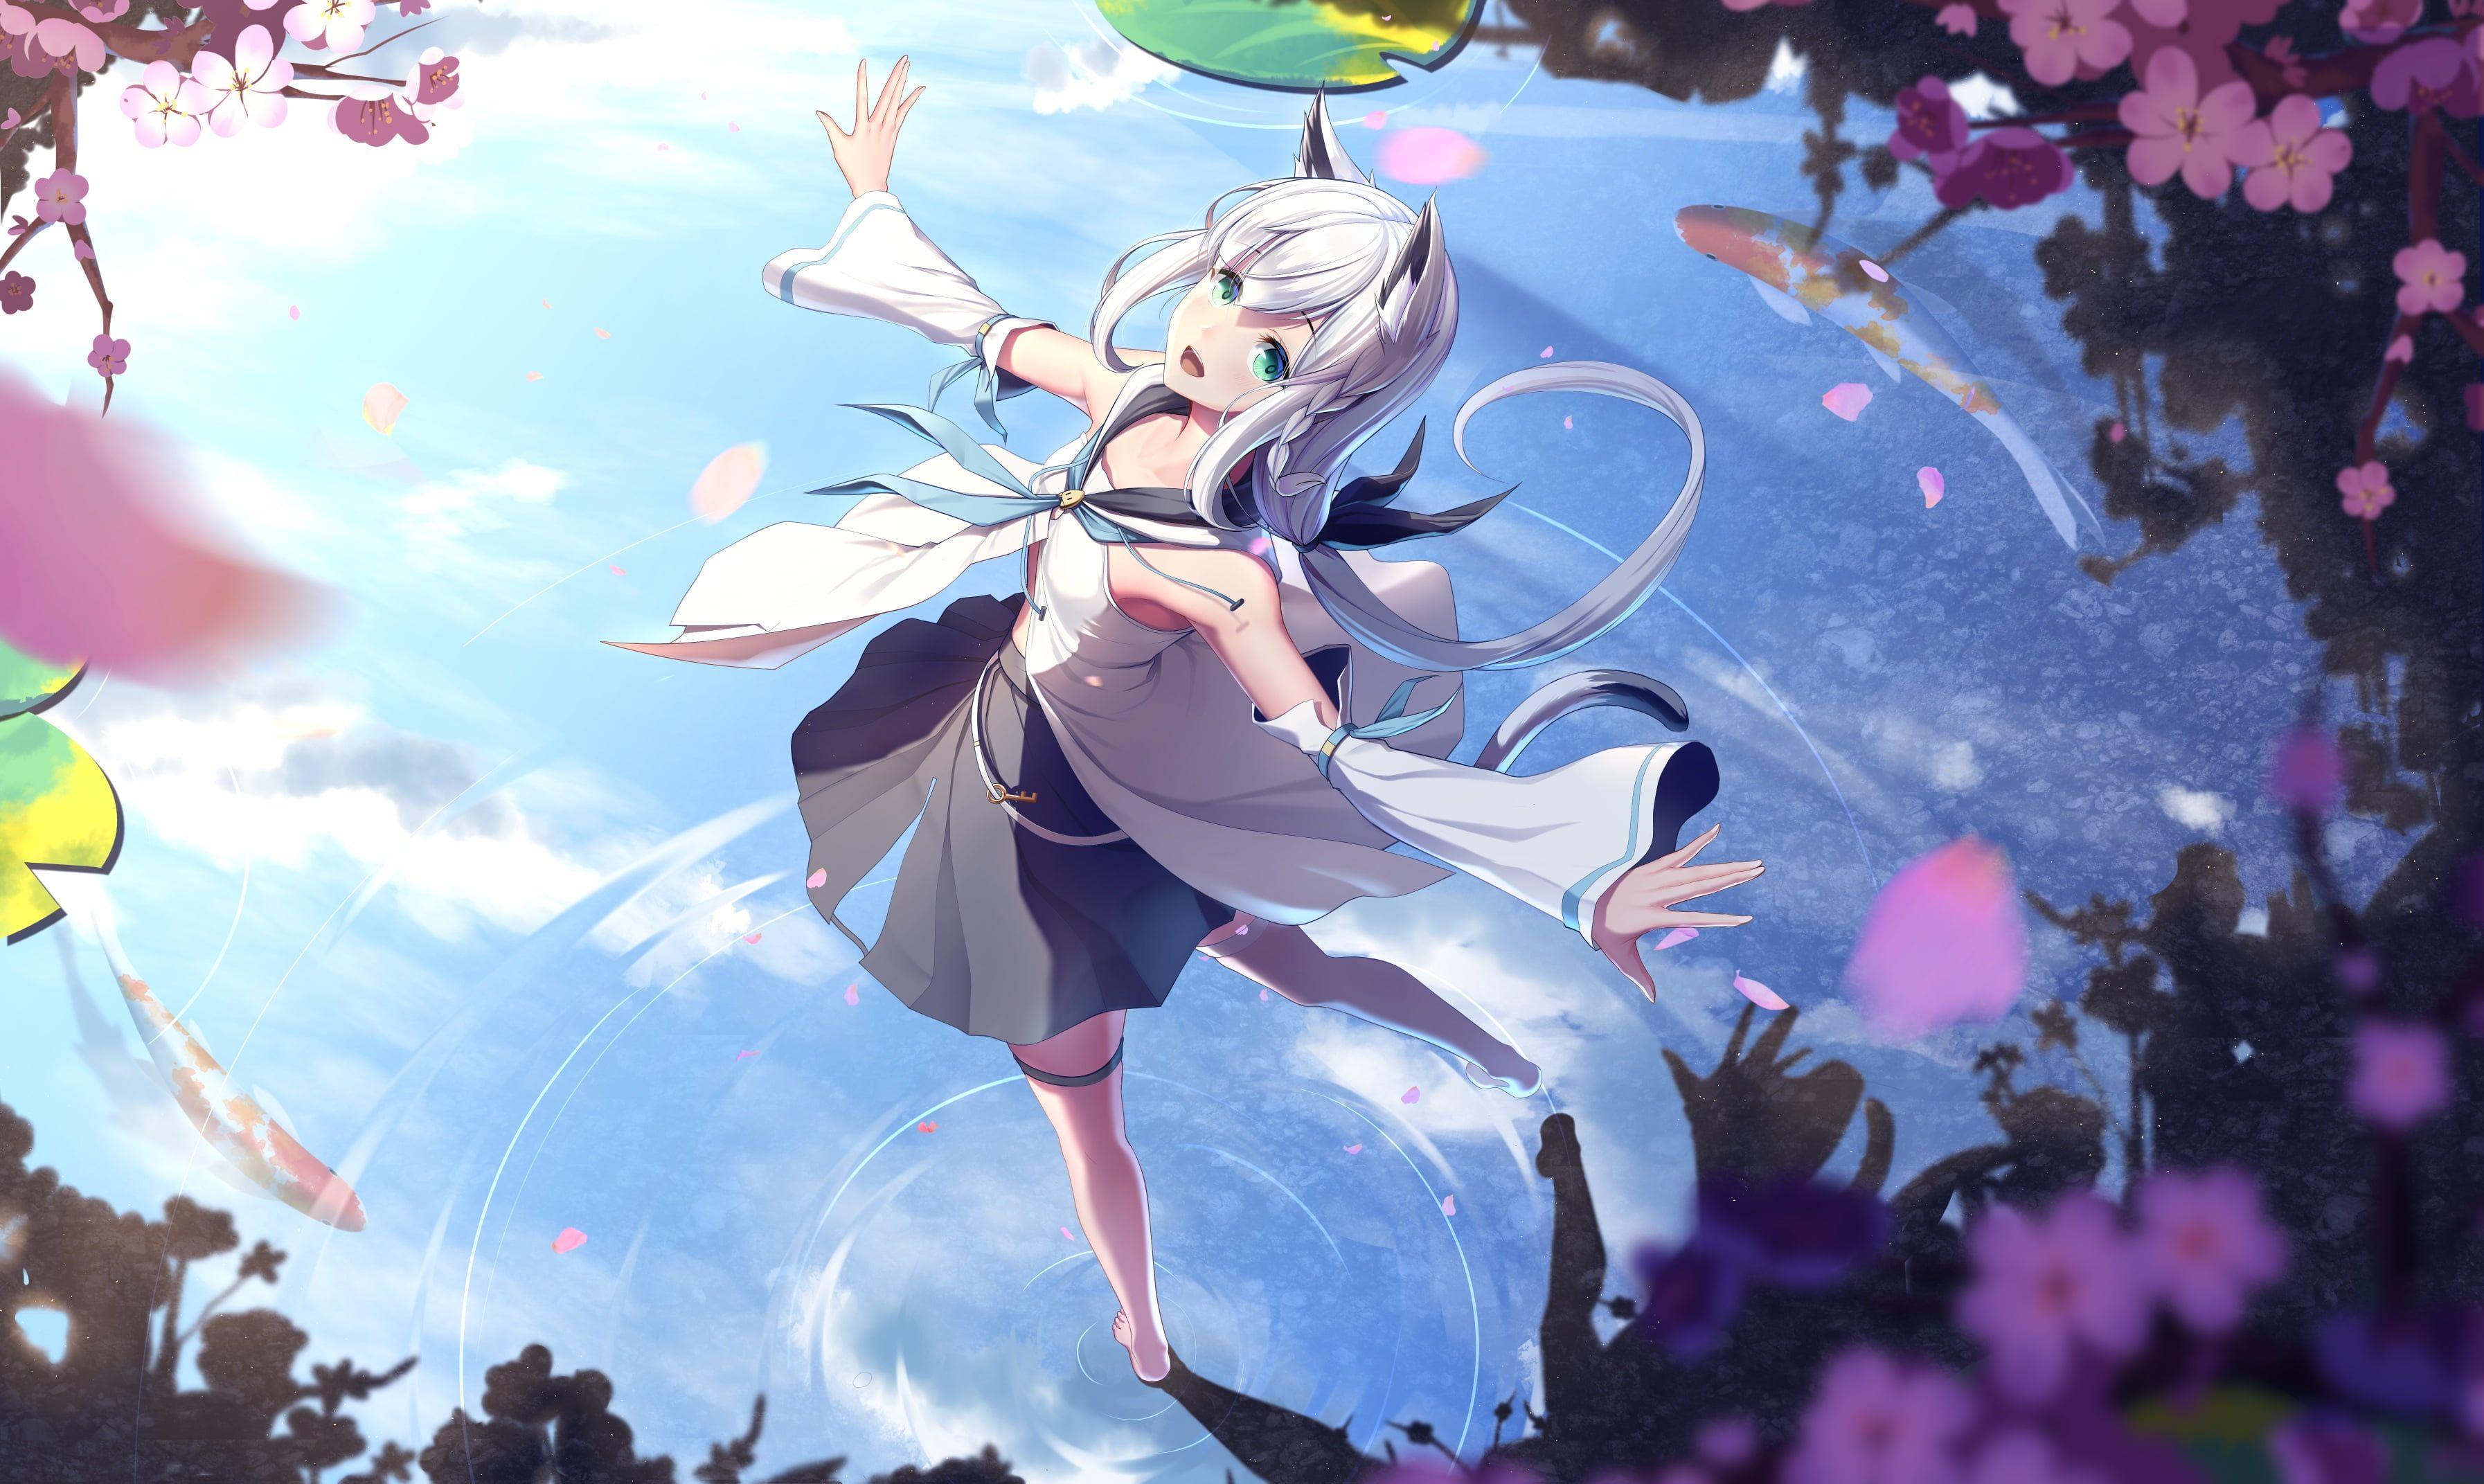 Anime Virtual Youtuber Shirakami Fubuki 2k Wallpaper Hdwallpaper Desktop Anime Hd Anime Wallpapers Anime Wallpaper